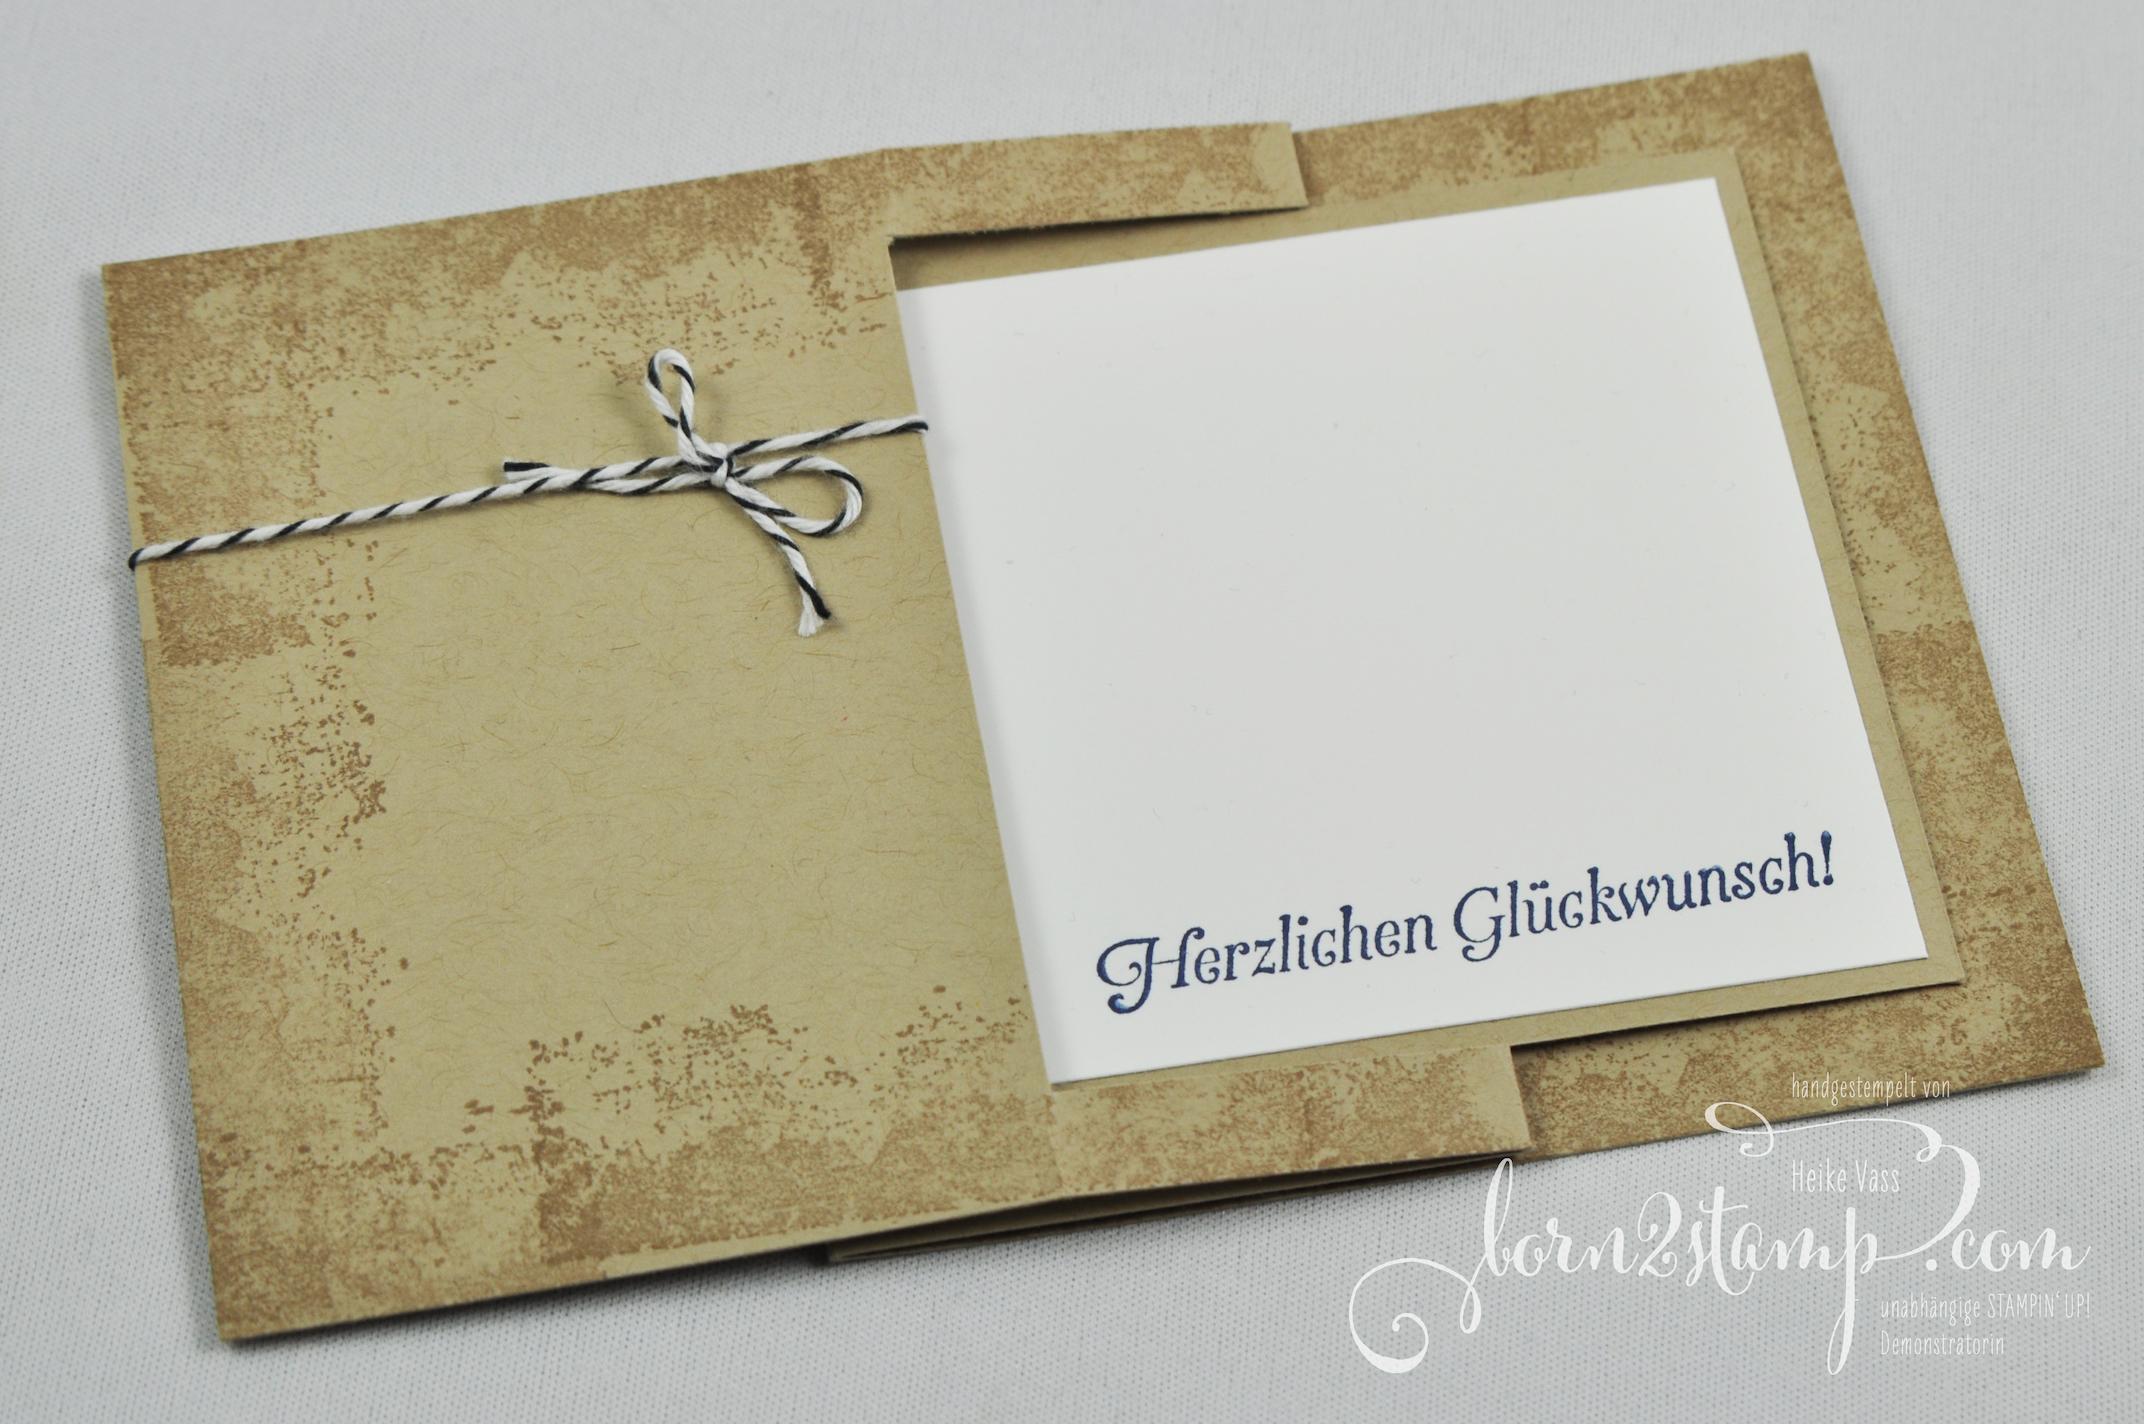 born2stamp STAMPIN' UP! Geburtstagskarte – Sale-a-bration – SAB – Hoch hinaus – Timeless Textures